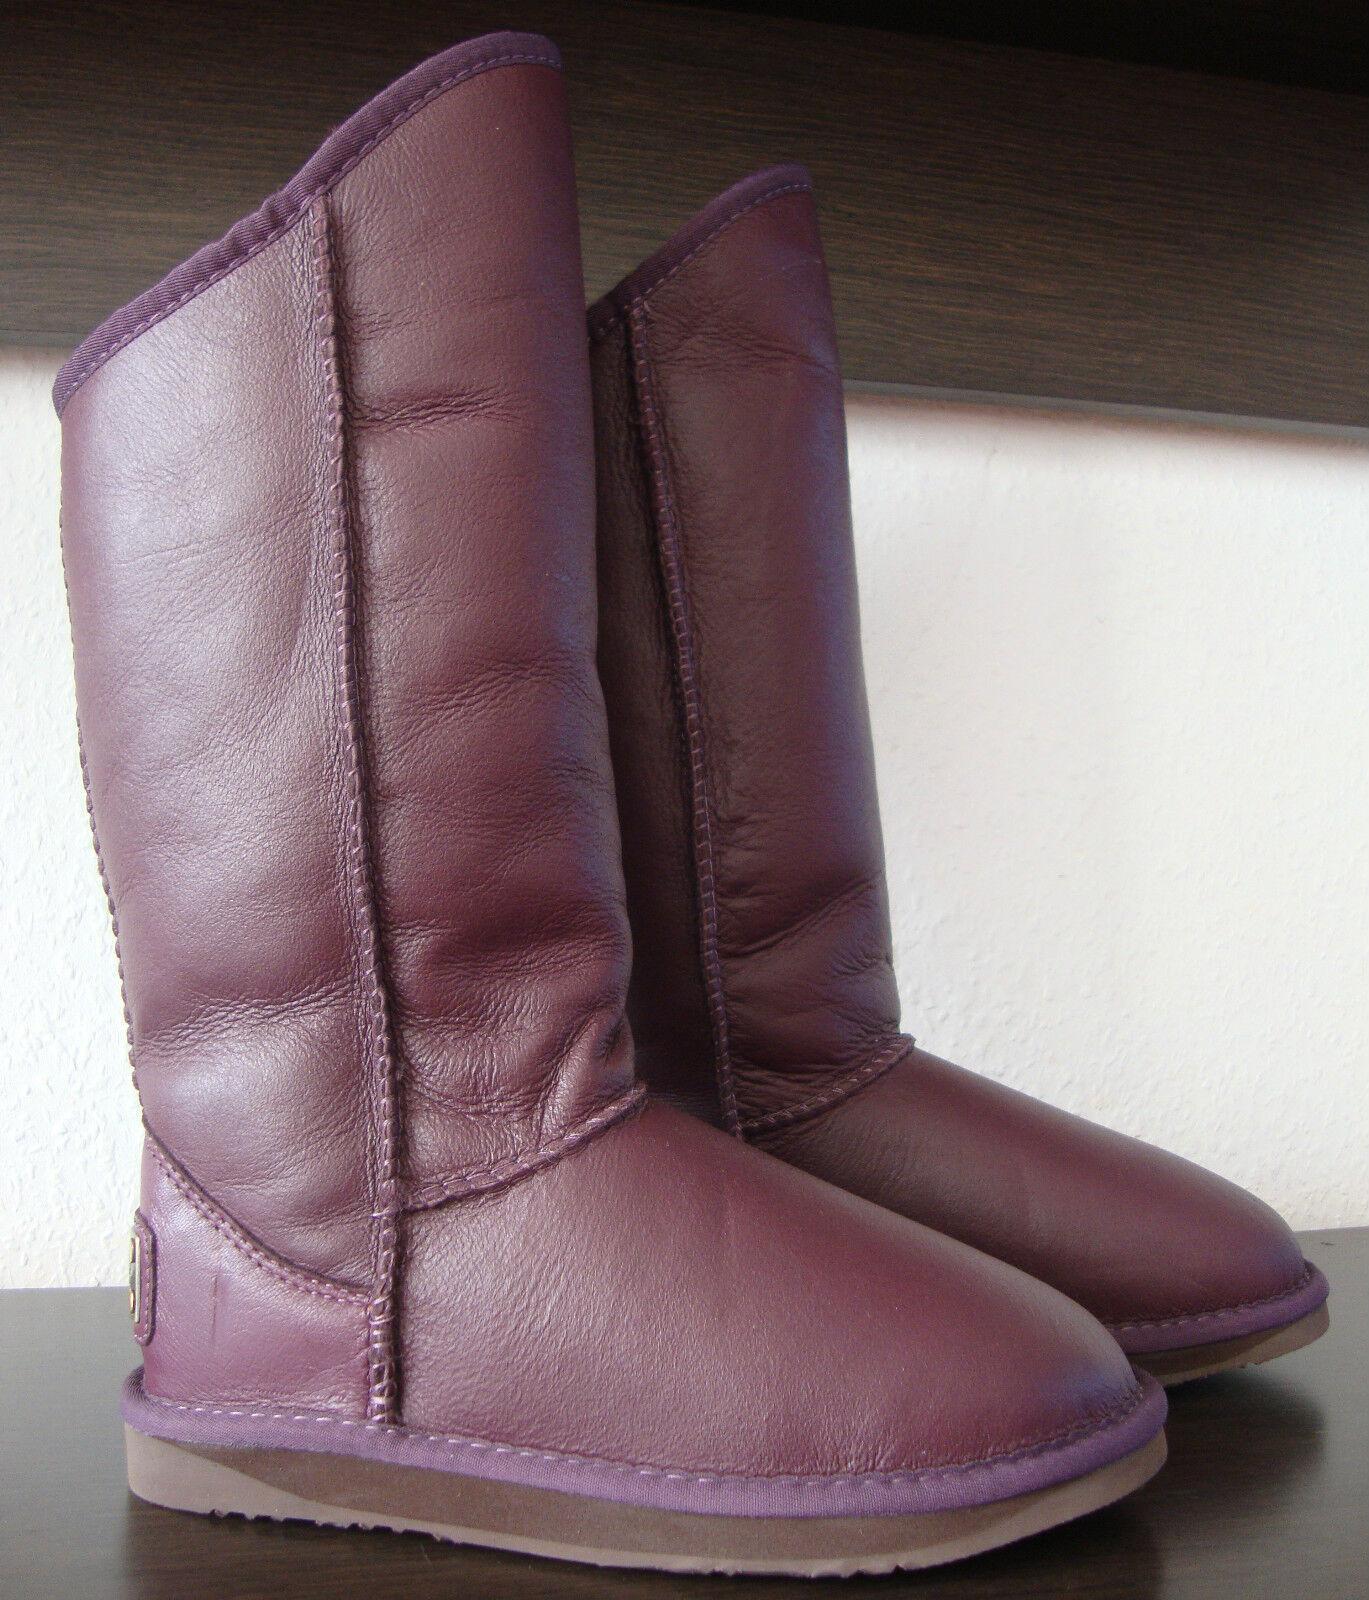 A TRALIA Stiefel LUXE COSY TALL Stiefel TRALIA Damen Stiefel Leder Schuhe Lila Gr.37 NEU eaf00a